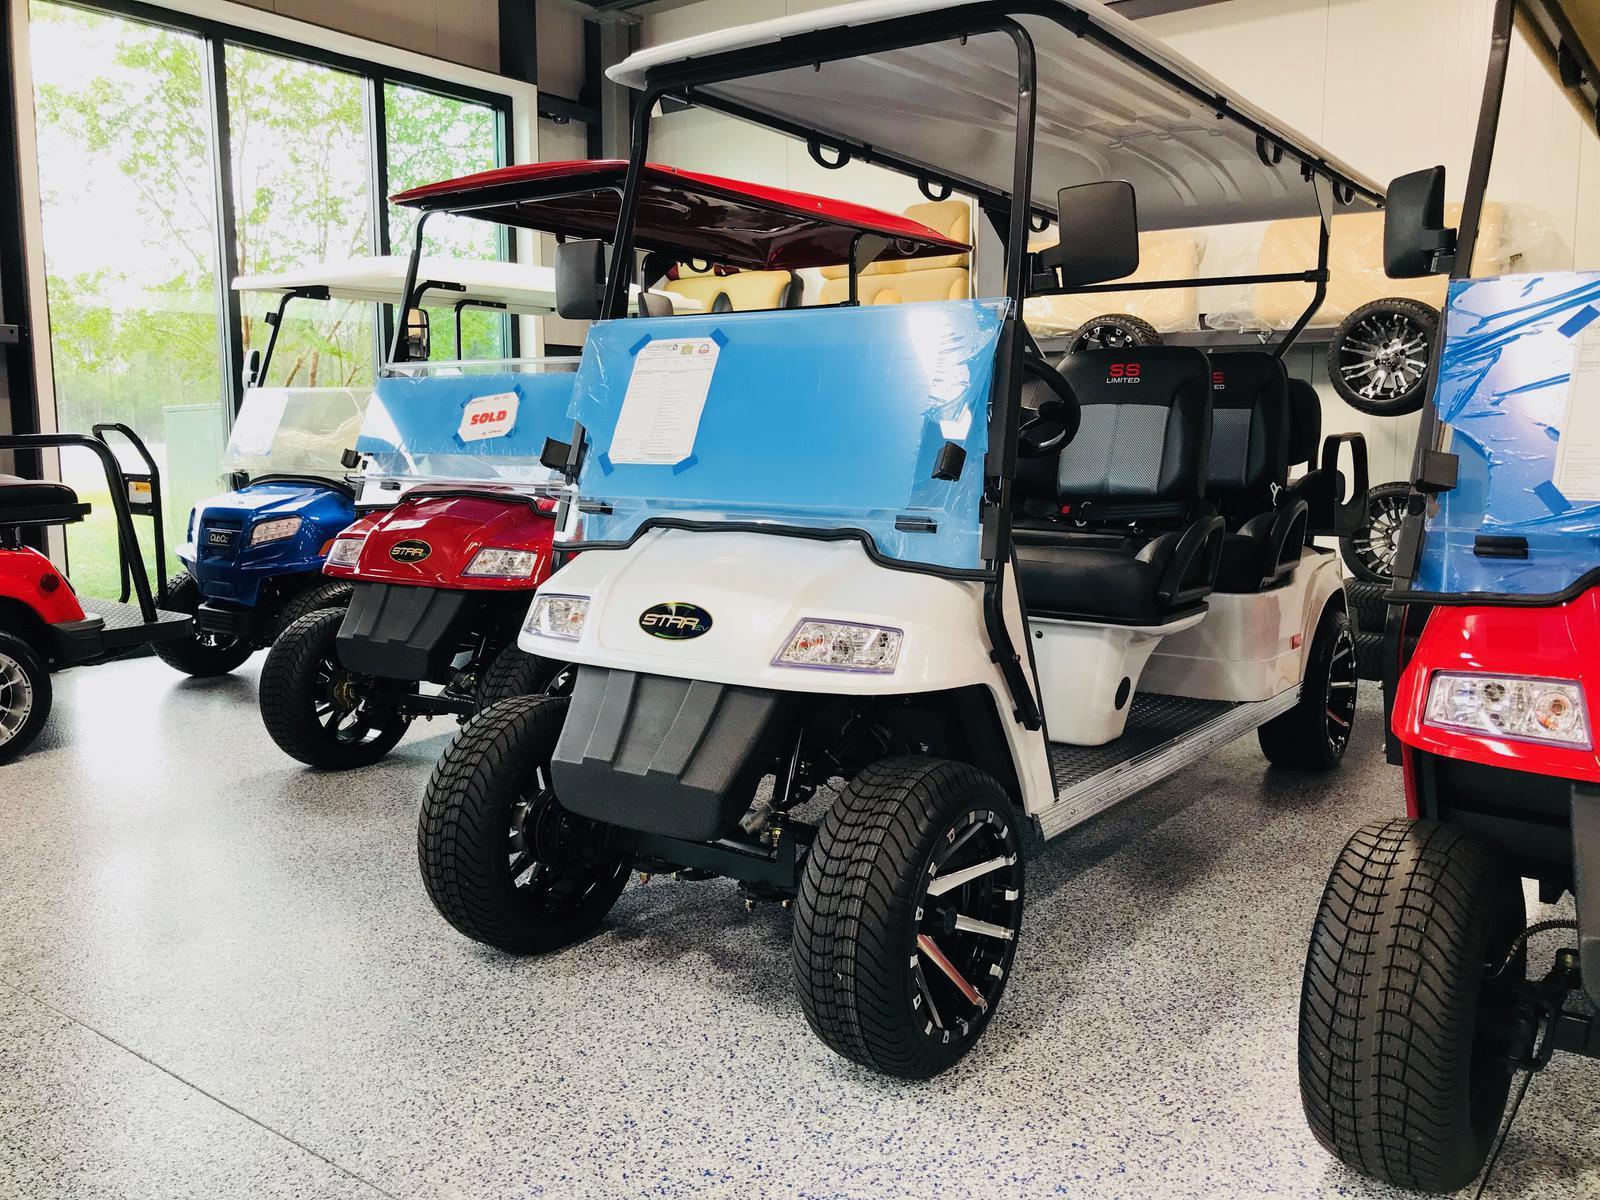 Inventory Electric Cart Company - Santa Rosa Beach Santa Rosa Beach on